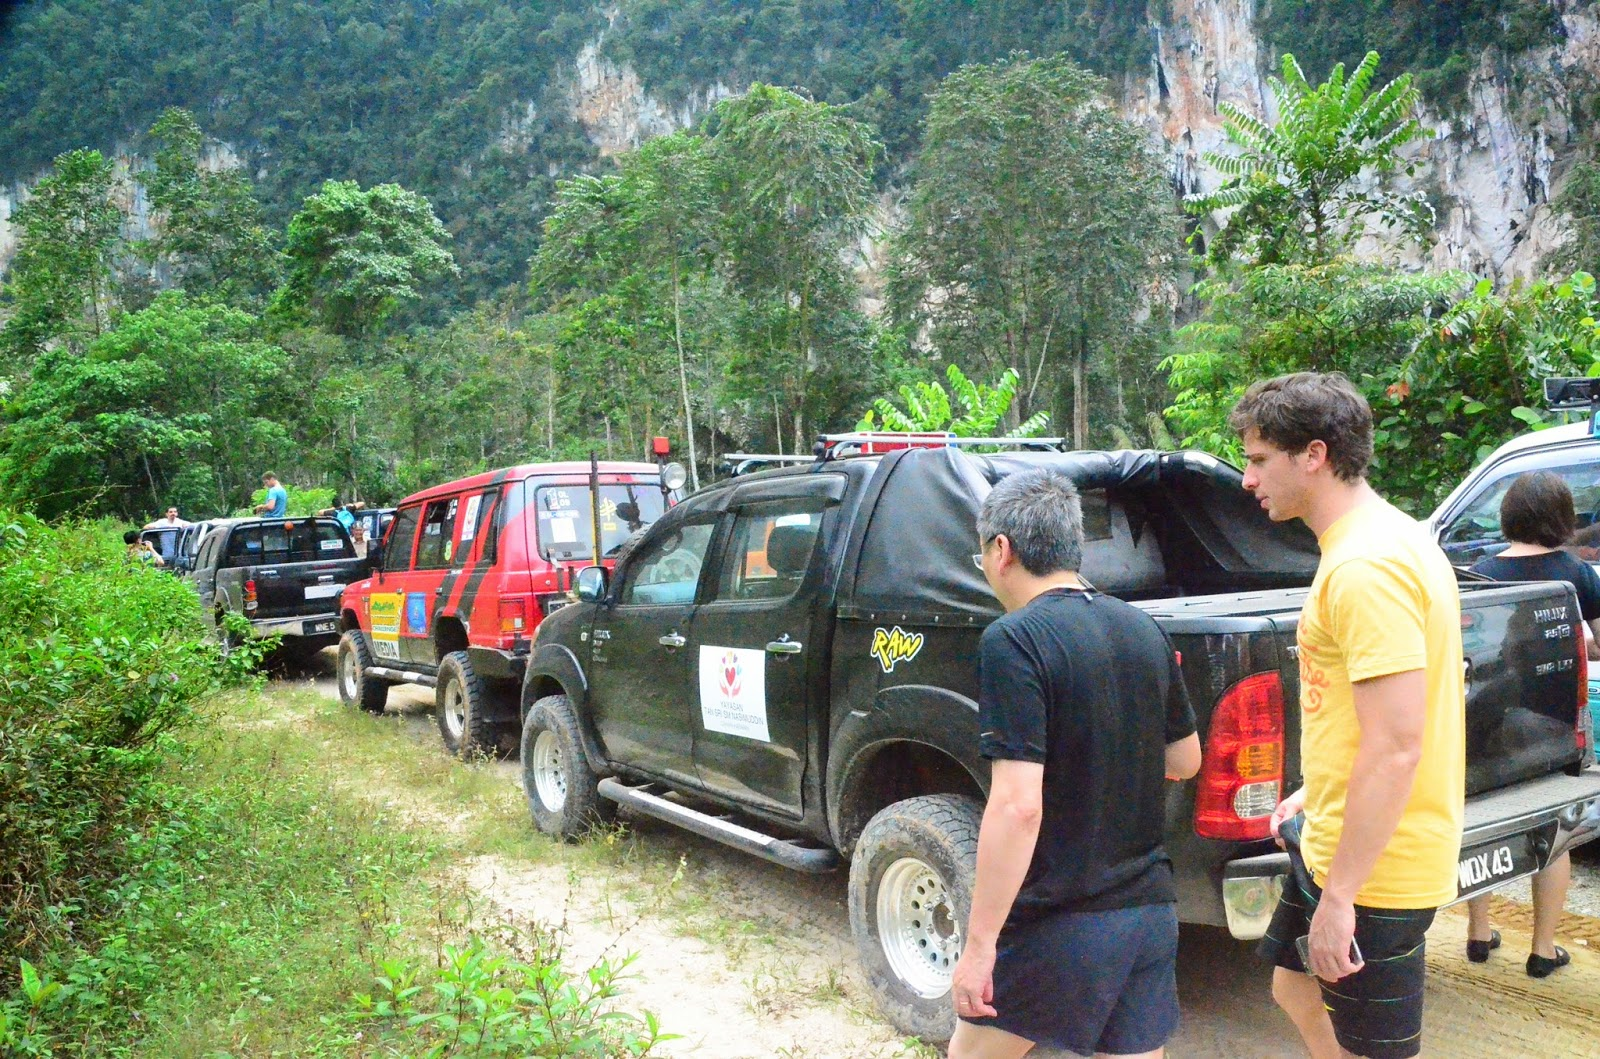 4x4 Off Road Adventure Tour TeamBuilding cum Jungle Survival